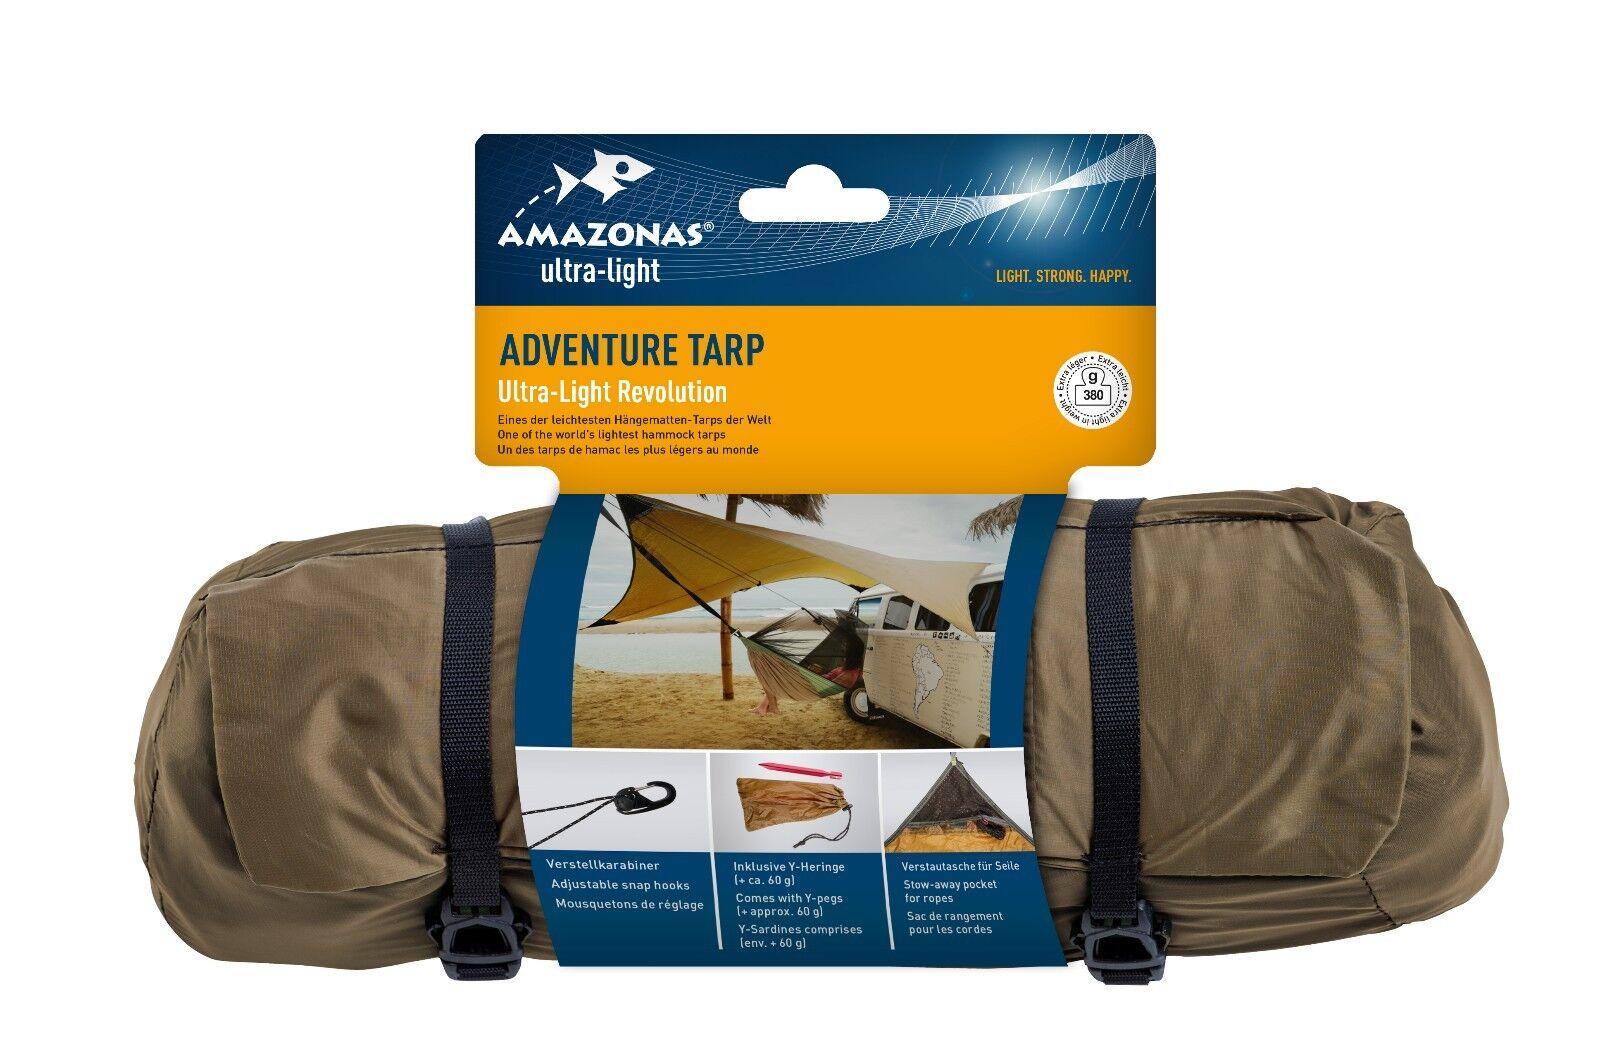 Amazonas TARP modelo Adventure ripstop 20t 2 & veces de silicona incl. arenques & 2 bolsa ee3baf